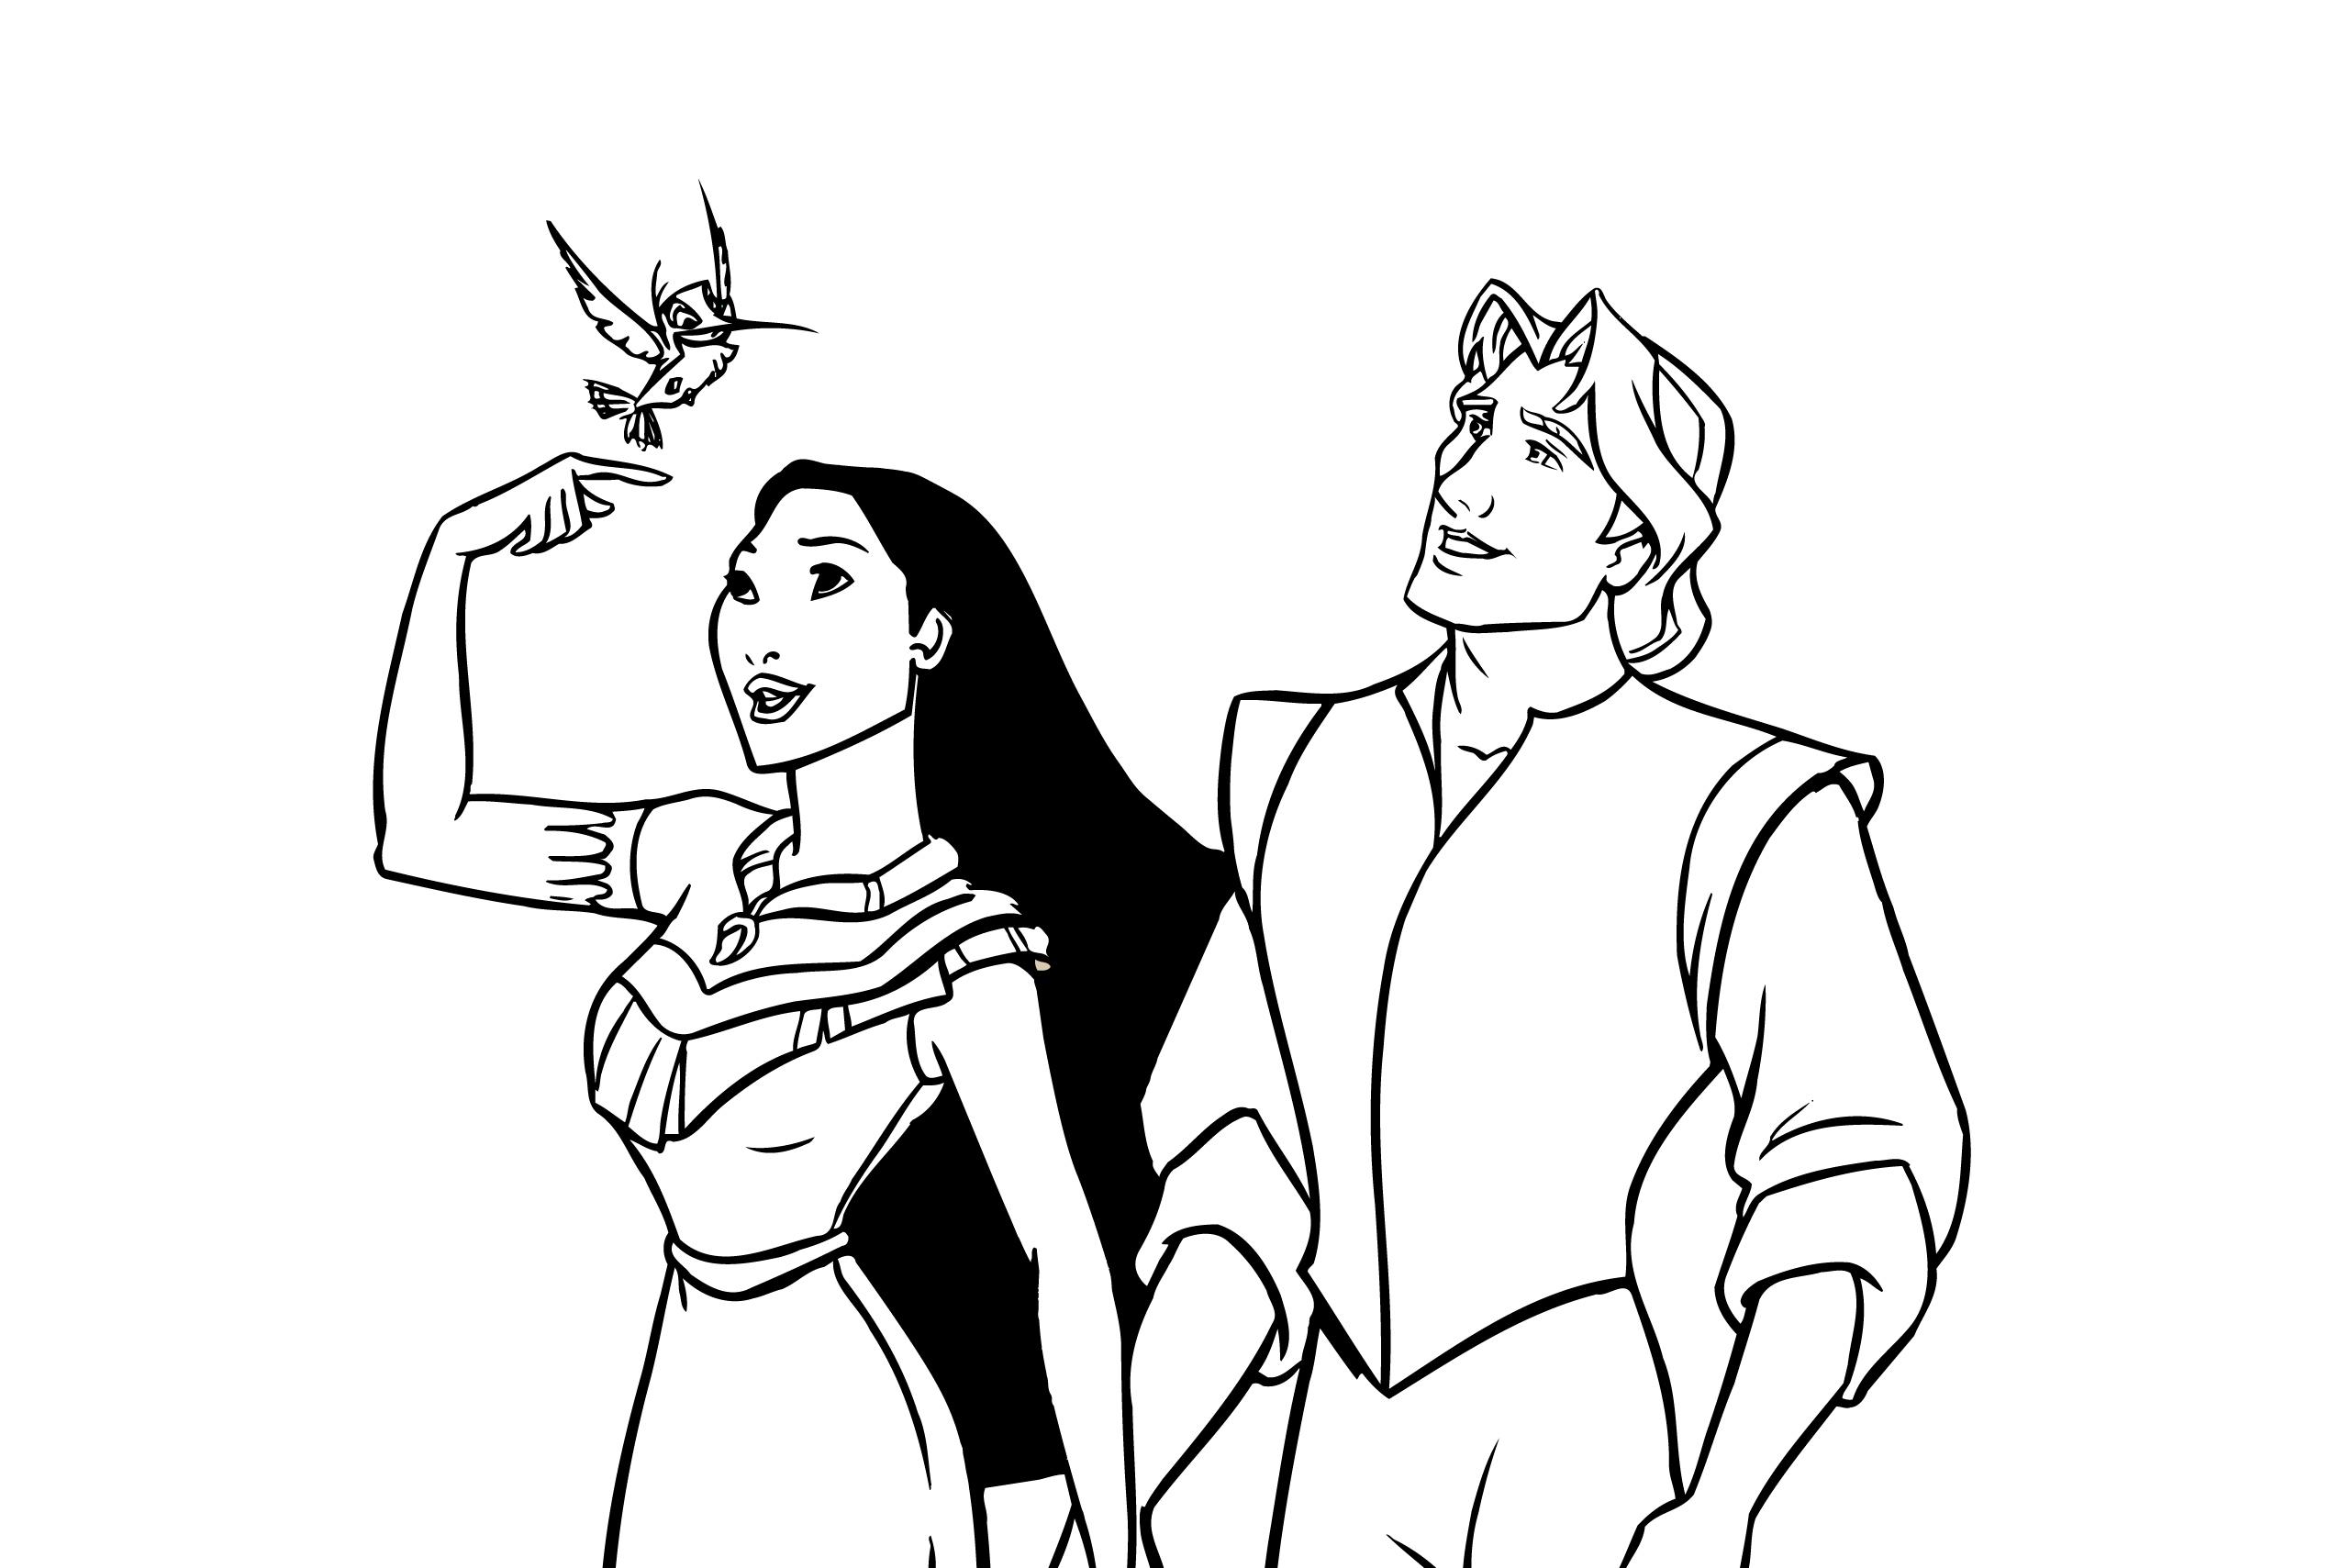 Artherapie coloriage gratuit vectorhq disney princesse pocahontas tumb